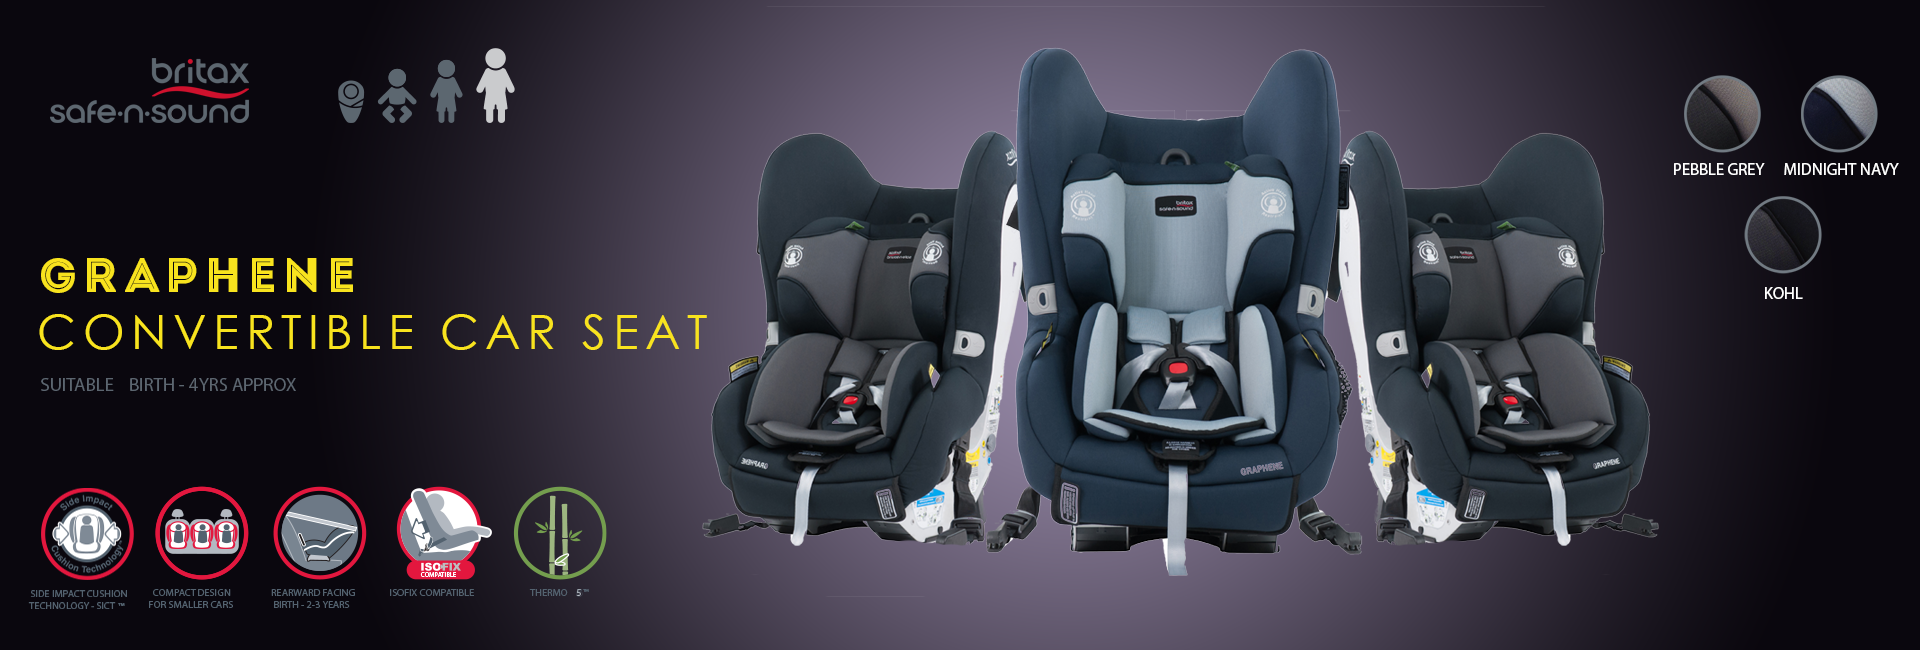 Britax Graphene Convertible Car Seat